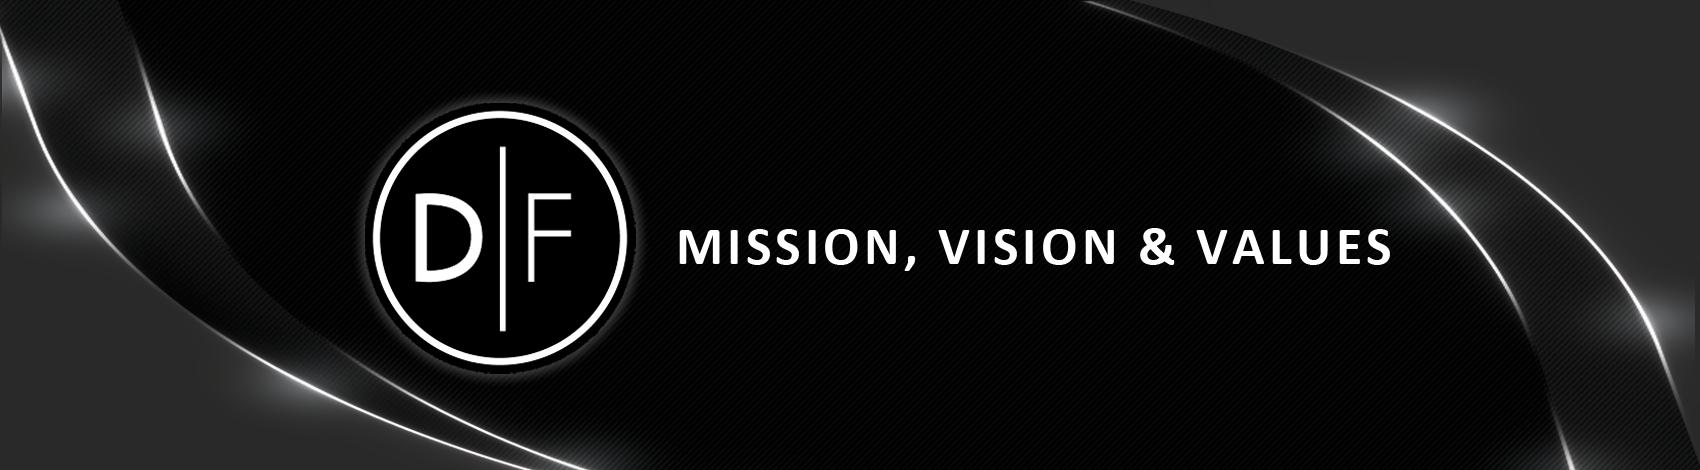 DF-Media Mission, Vision & Values